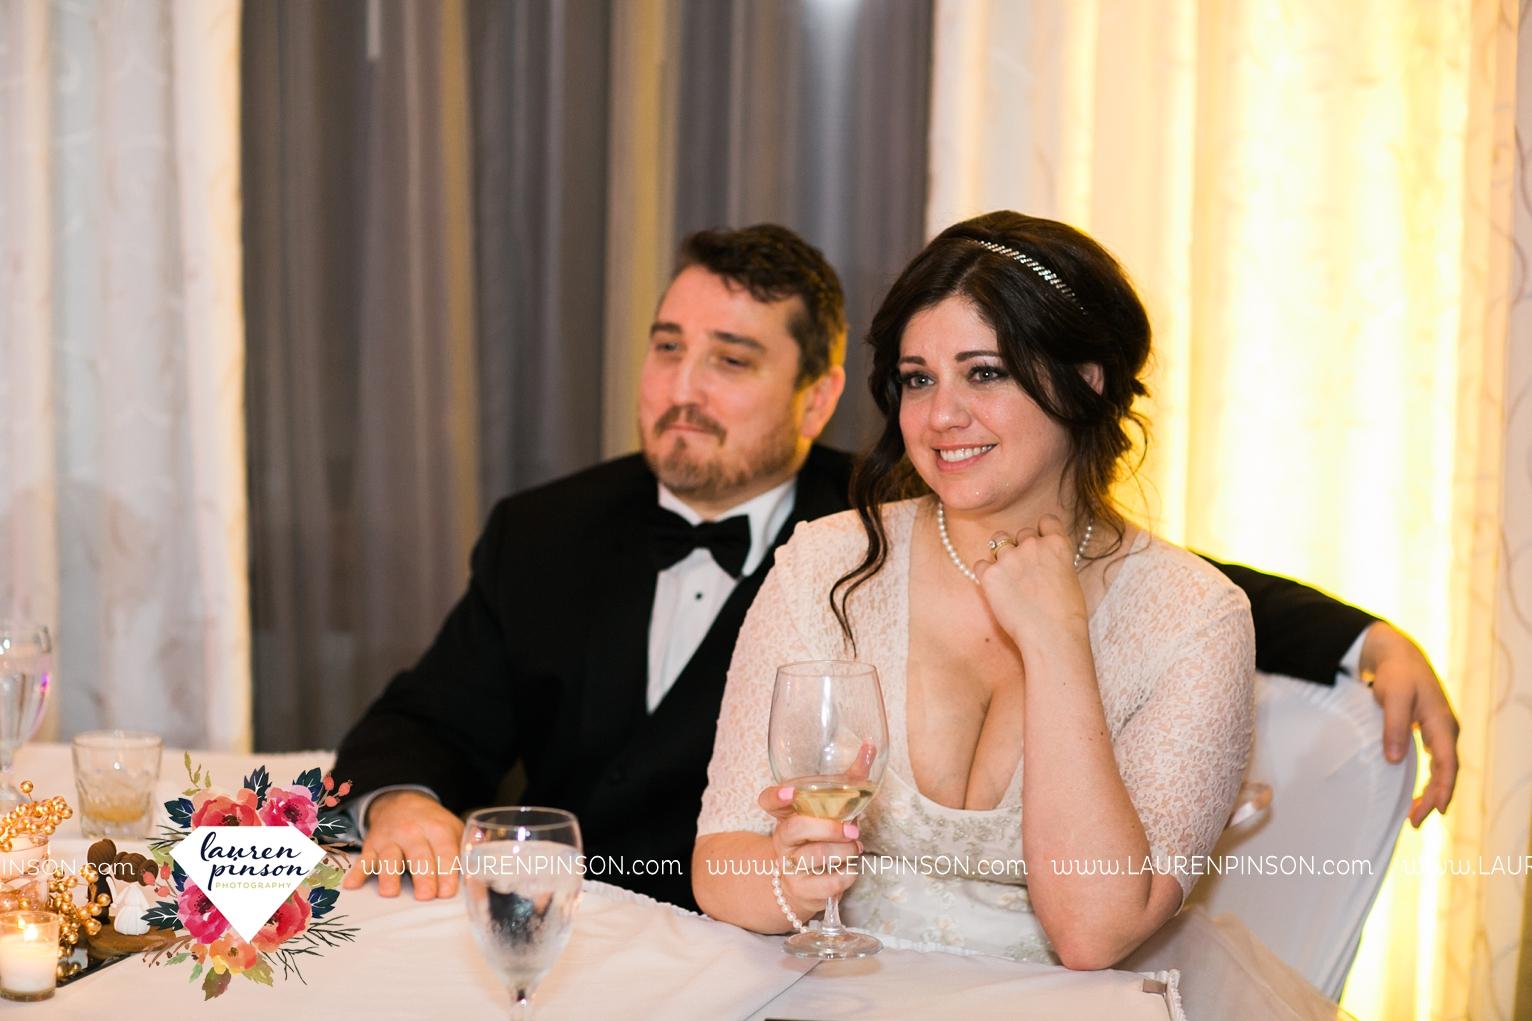 gainesville-texas-sherman-texas-thackerville-oklahoma-wedding-photographer-at-winstar-casino-golf-resort_2302.jpg